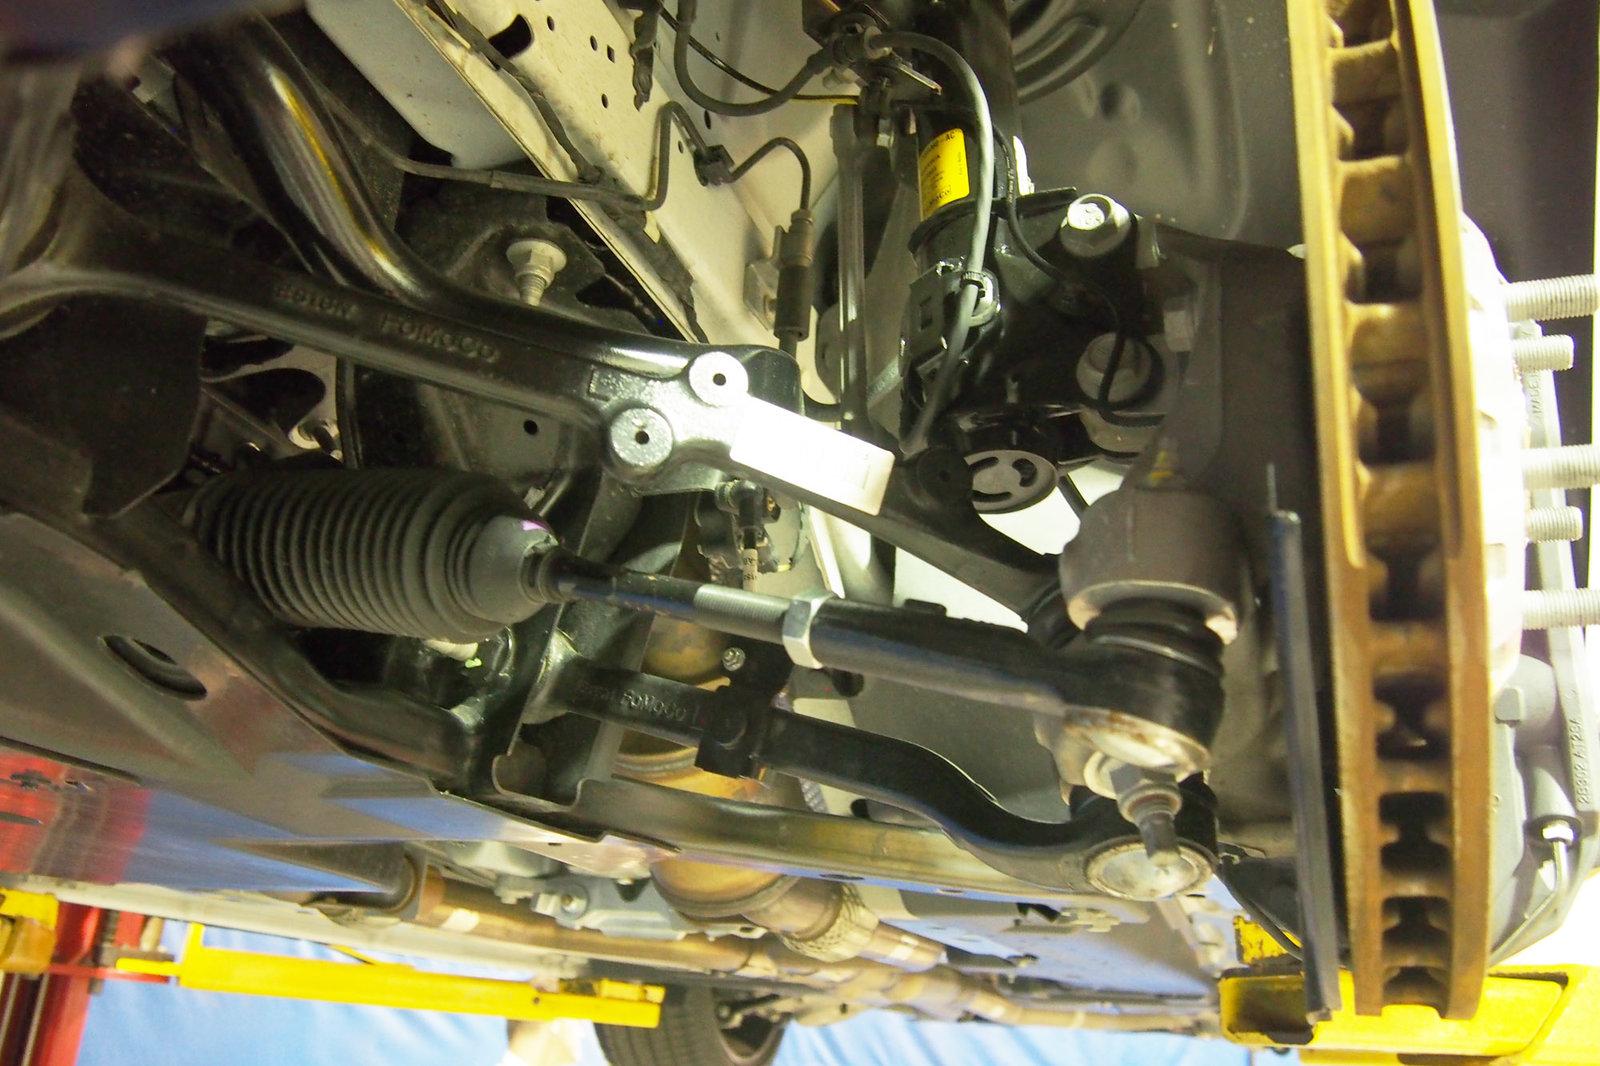 zzzzzzzzzzzzzzFord-Mustang-Shelby front control arm.jpg